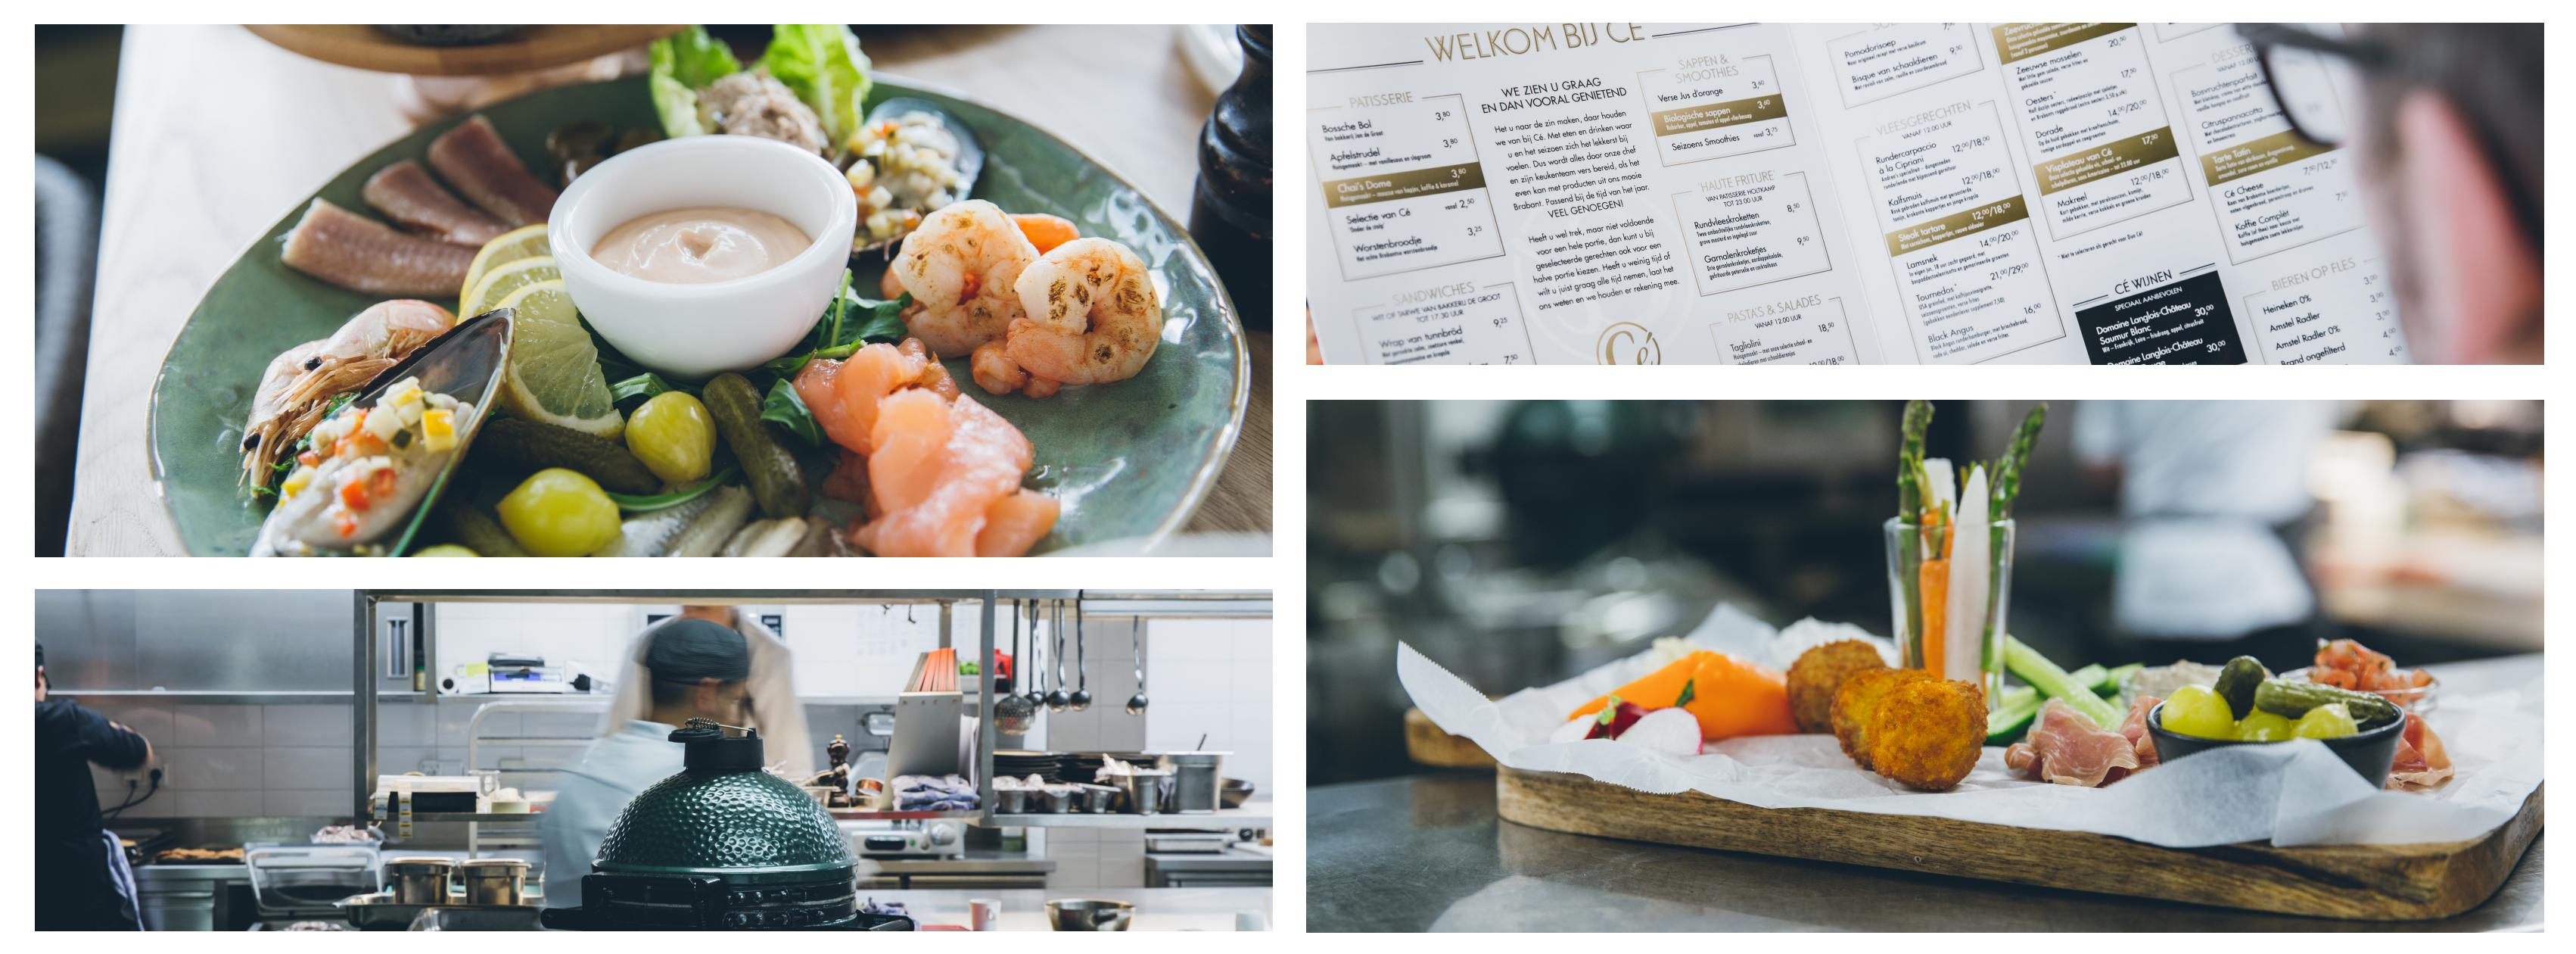 Groepen | Gerechten Cé Brasserie keuken bittergarnituur